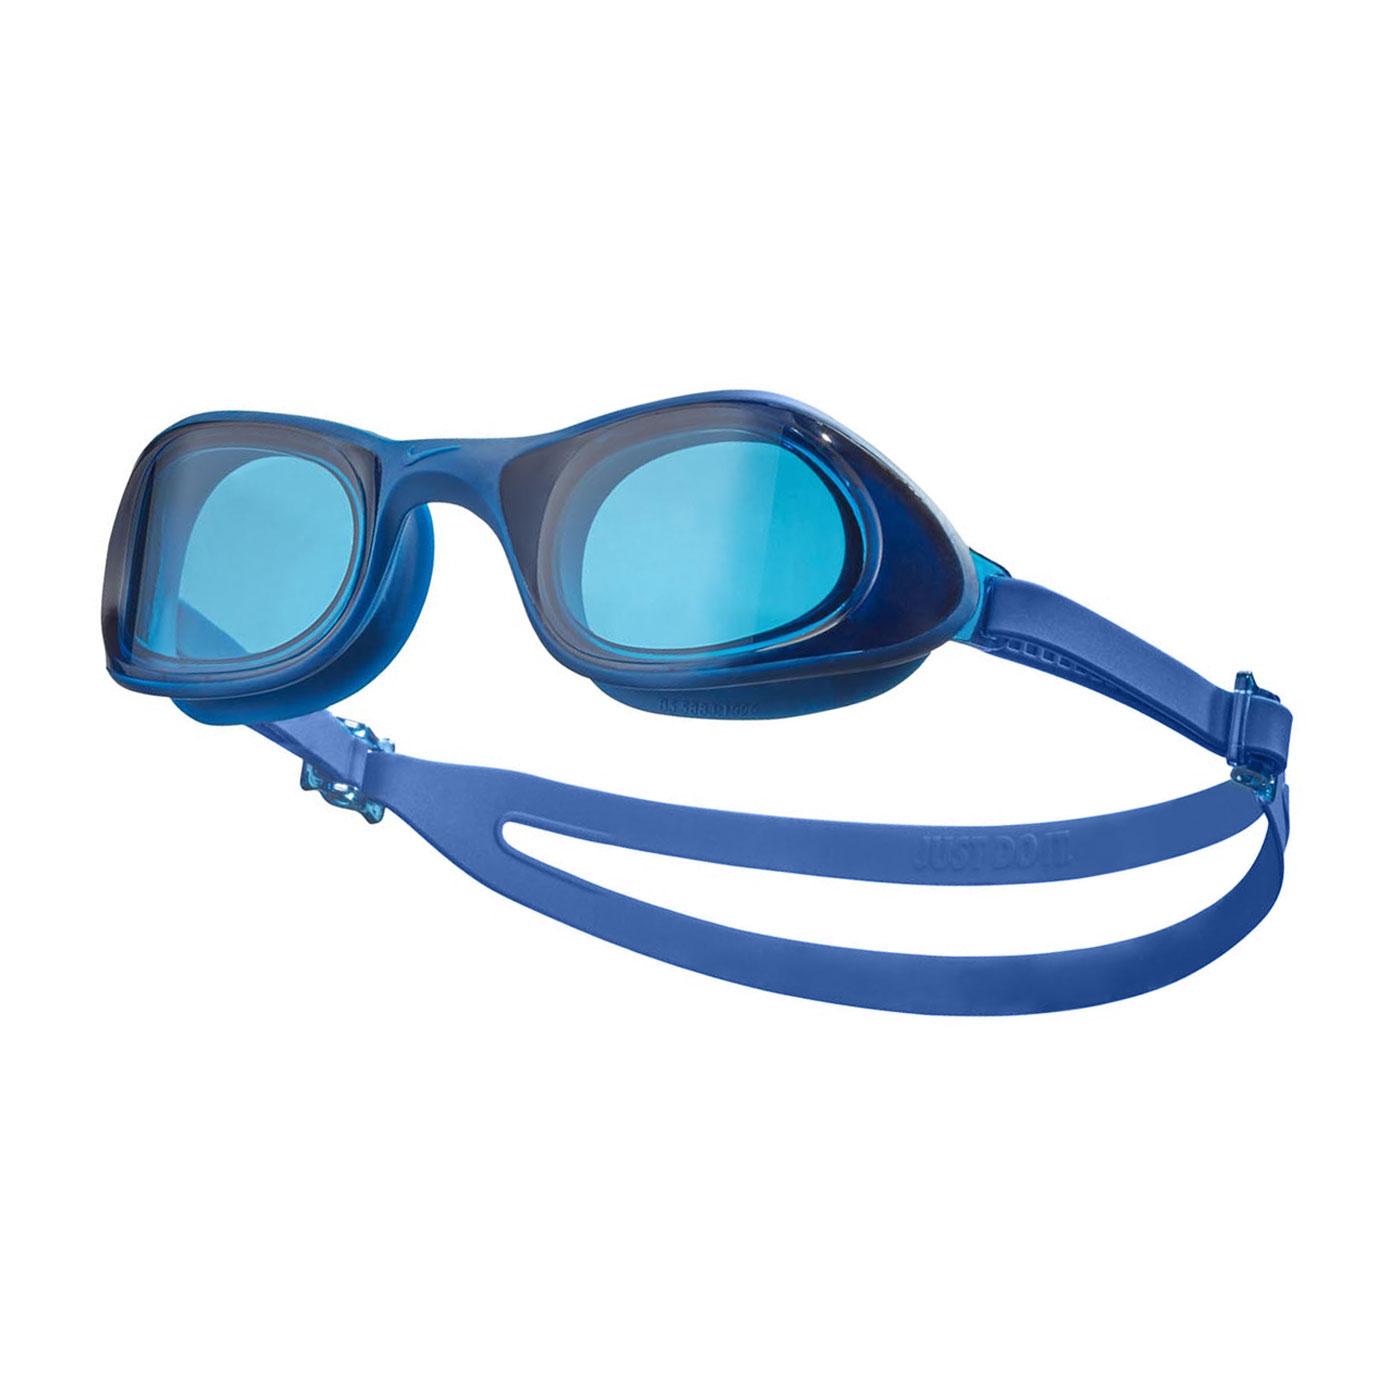 NIKE SWIM 成人超廣角泳鏡 NESSB161-400